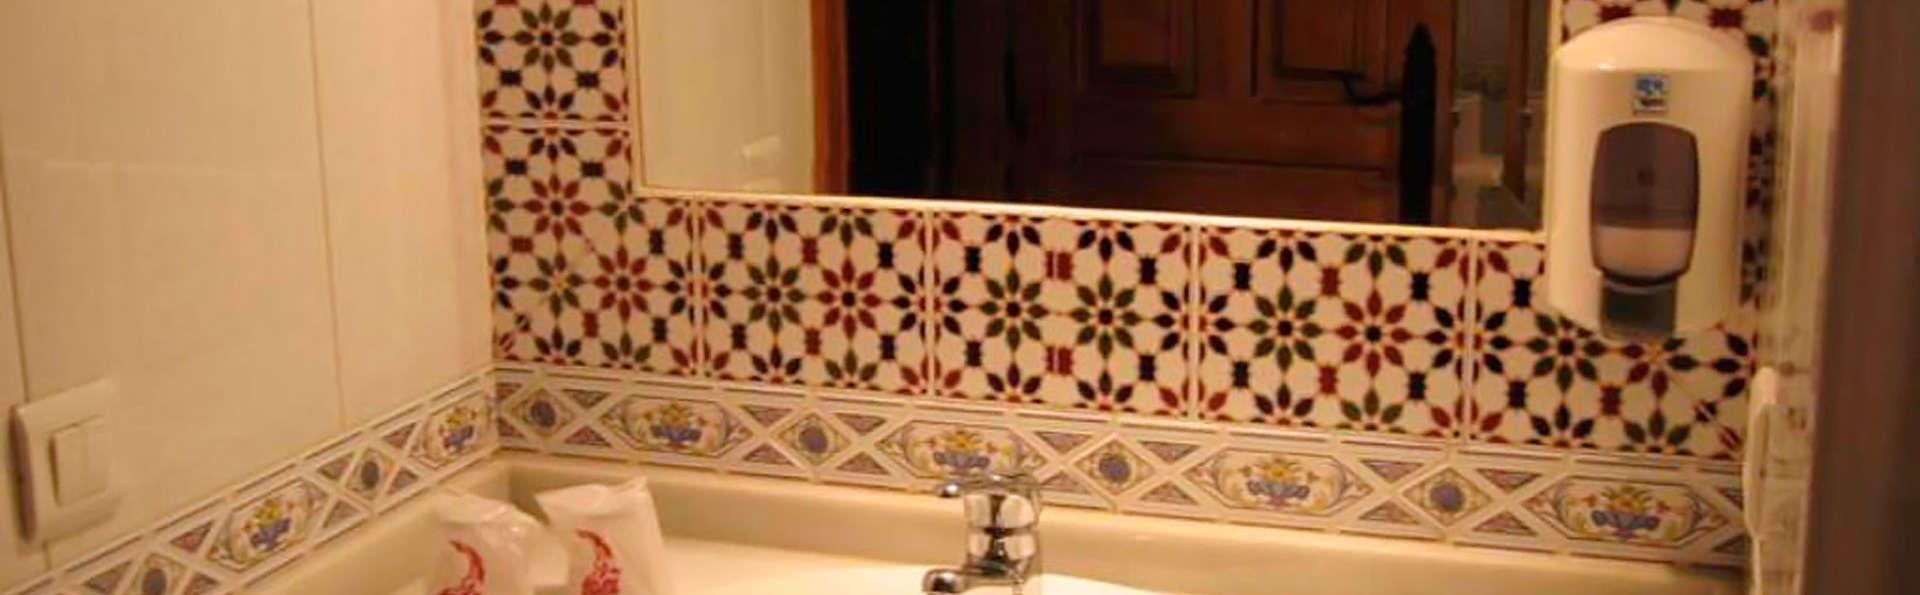 CTR Lajafriz - EDIT_bathroom.jpg